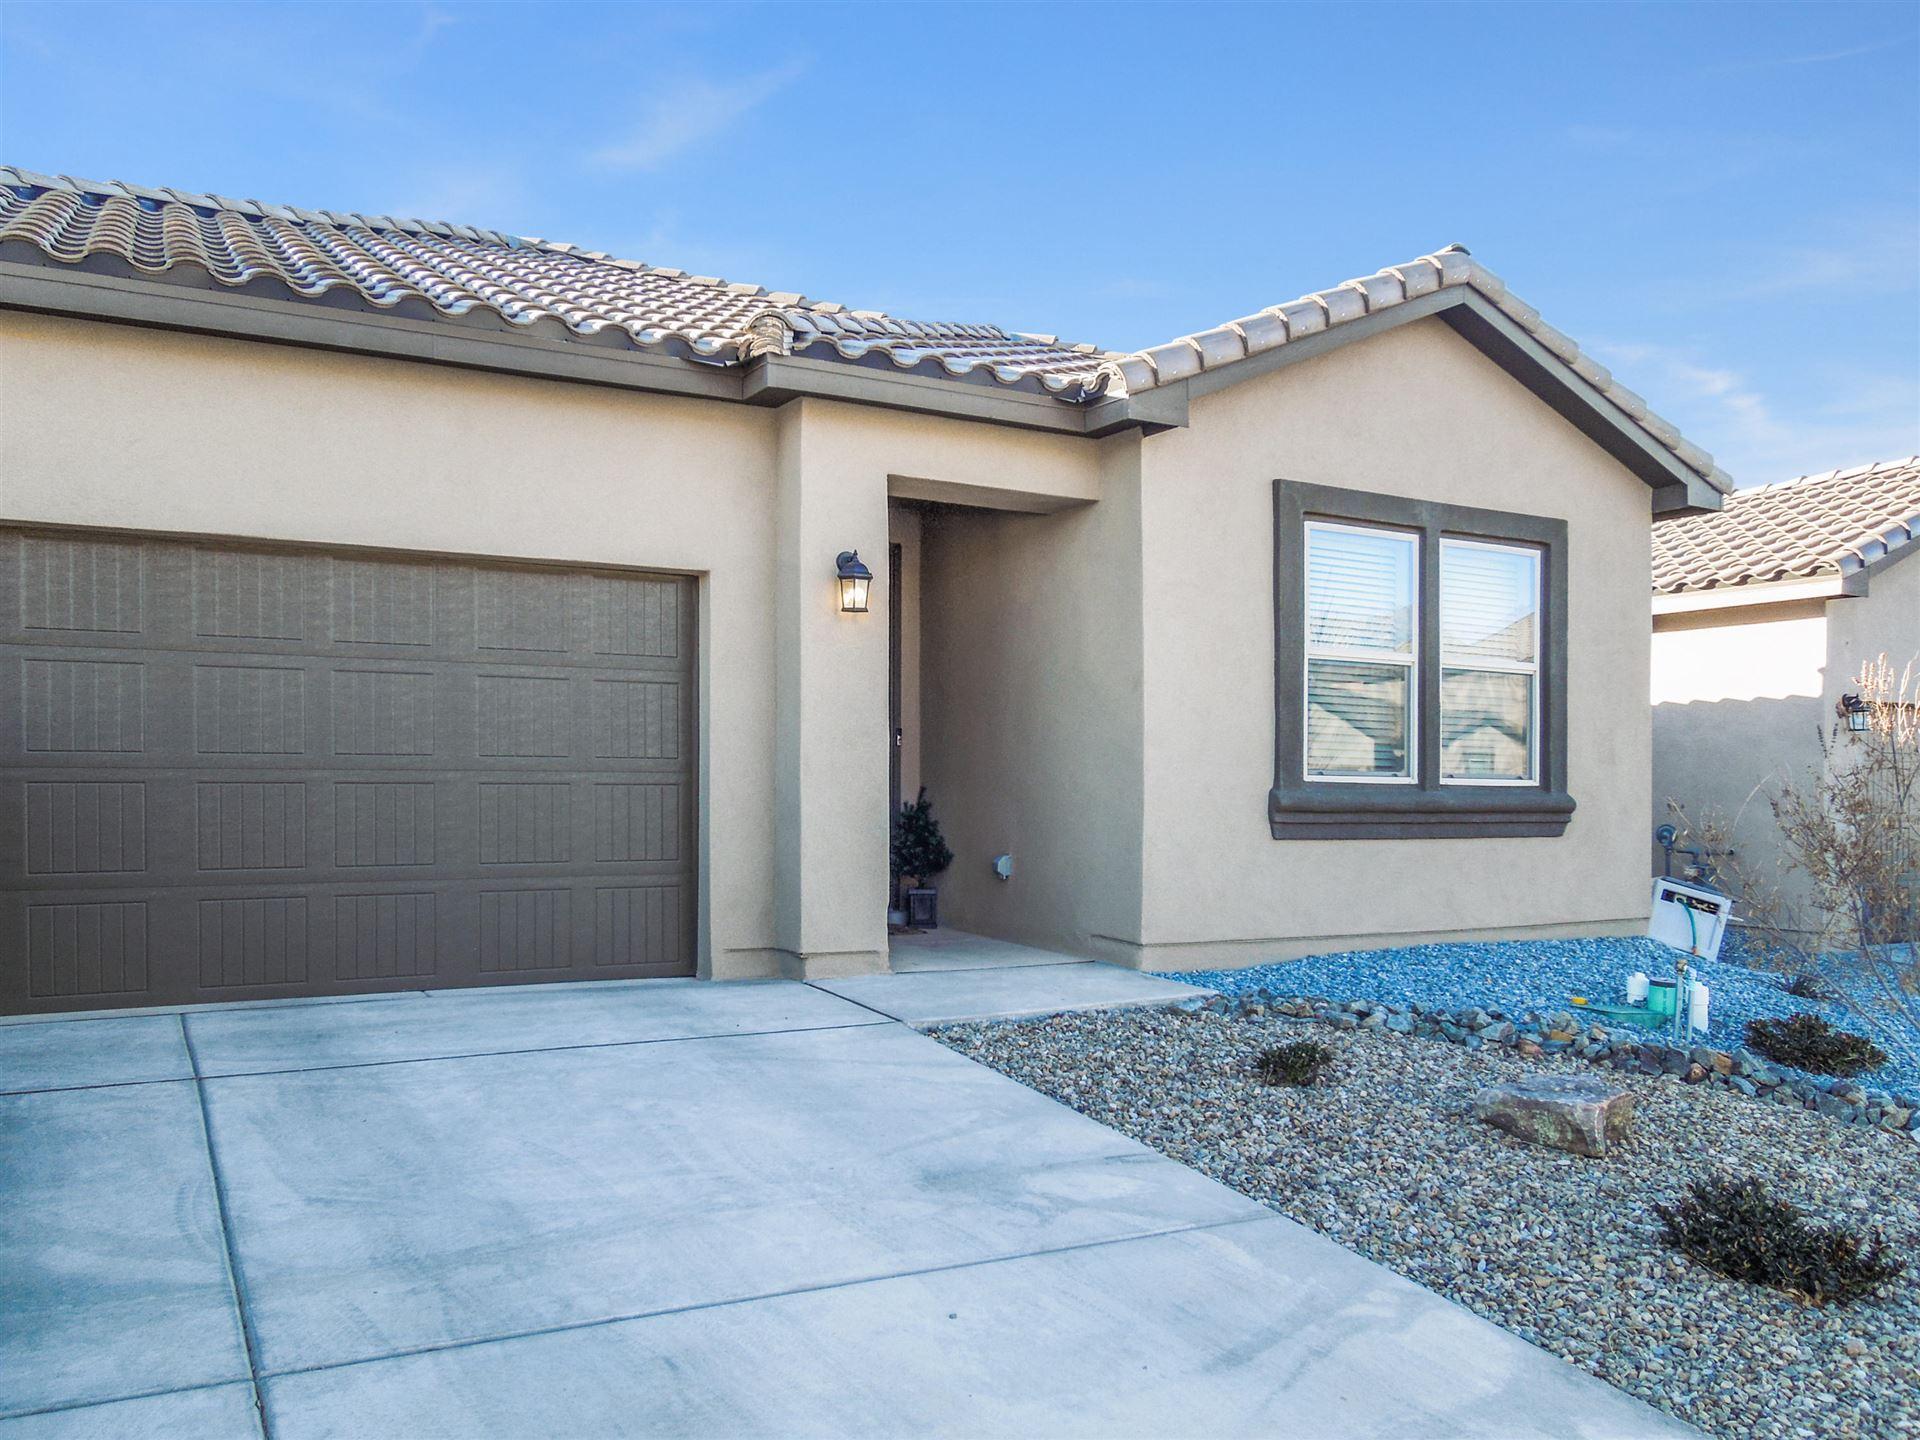 2035 SILVER DOLLAR Street SE, Albuquerque, NM 87123 - MLS#: 982862